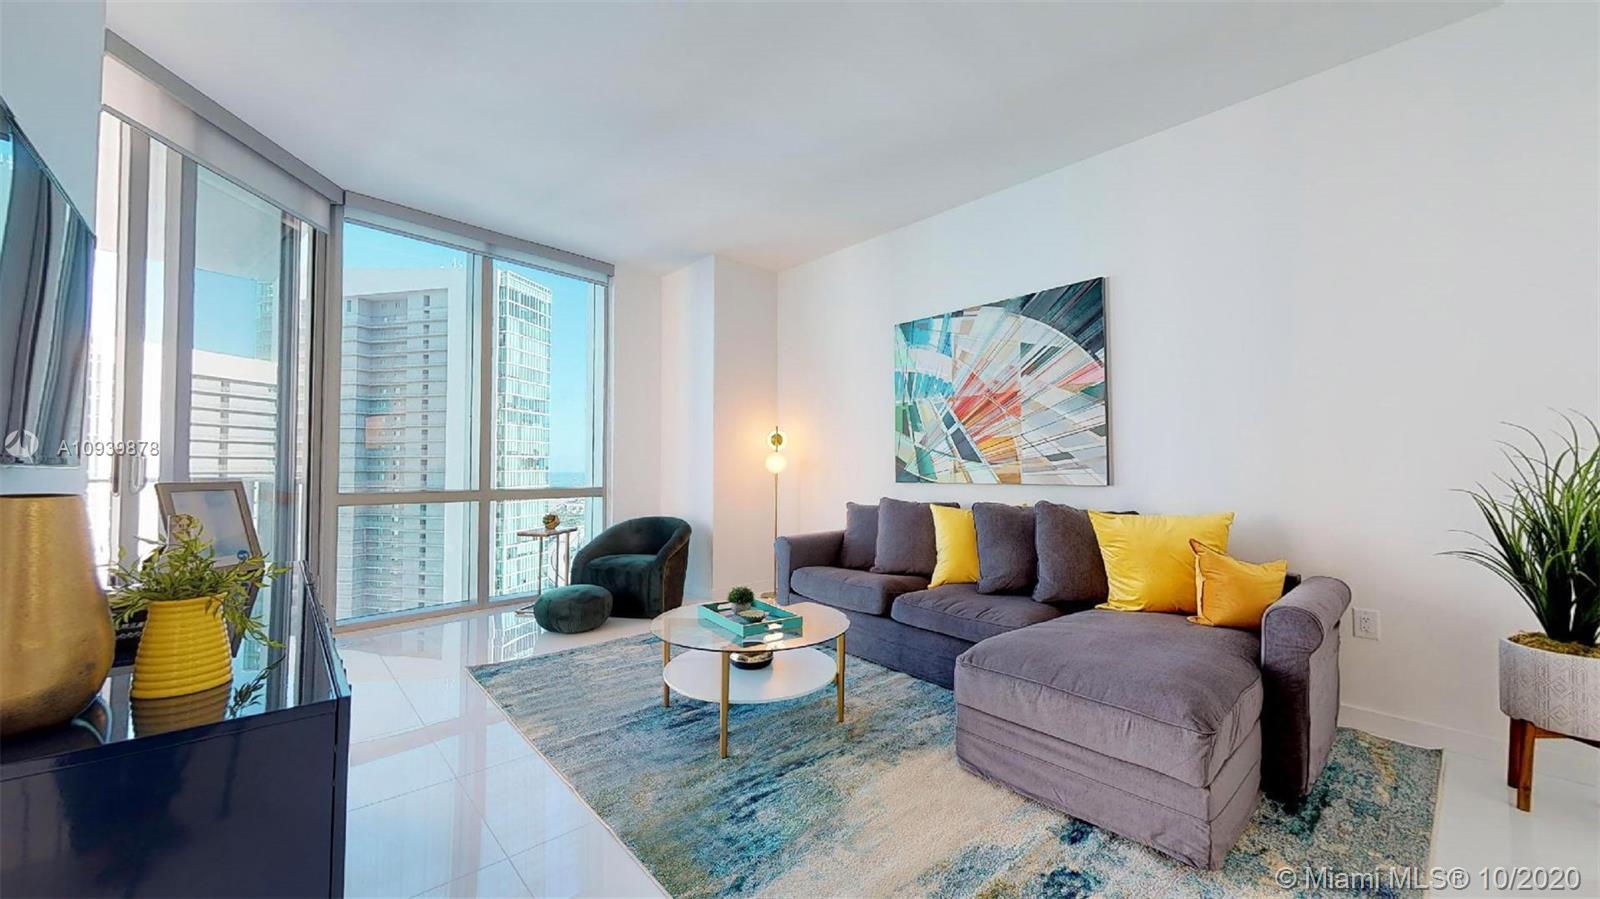 Paramount Miami Worldcenter #4105 - 851 NE 1st ave #4105, Miami, FL 33132